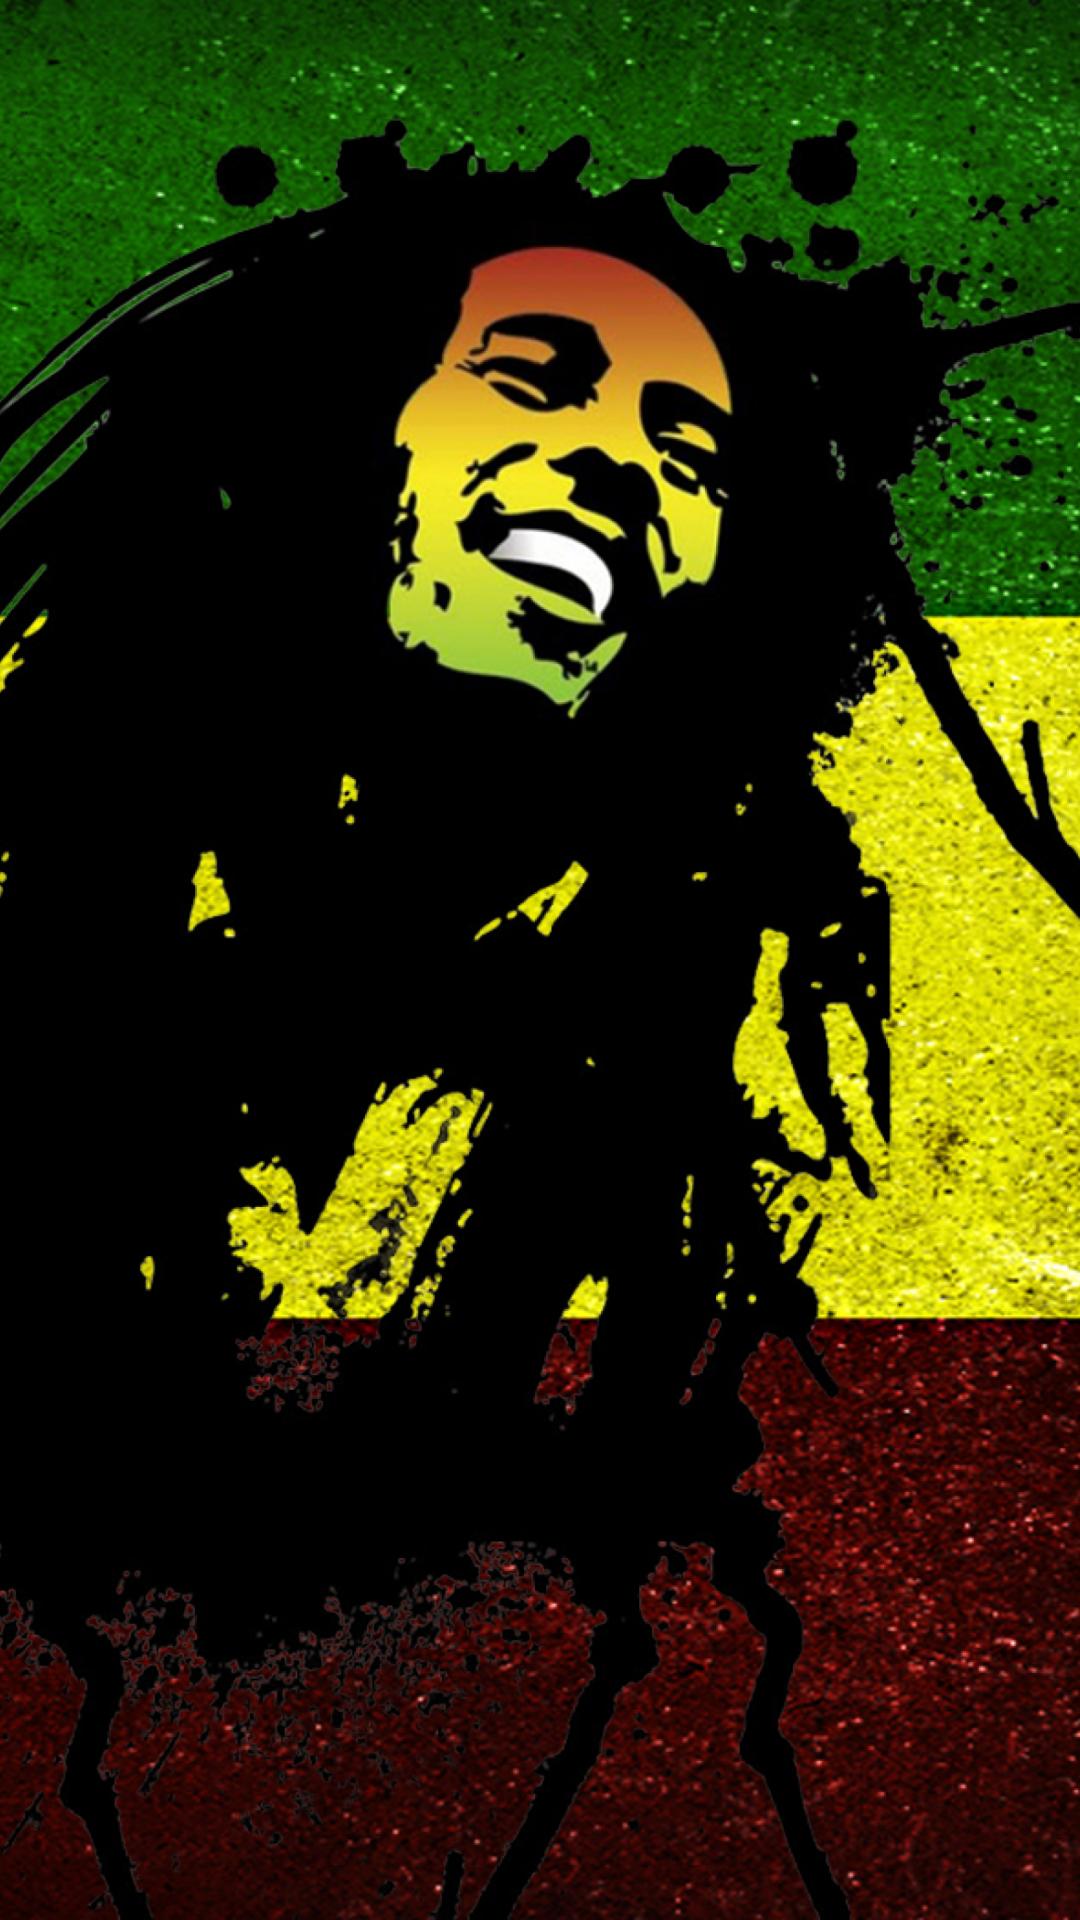 Bob marley rasta reggae culture wallpaper for 1080x1920 - Reggae girl wallpaper ...